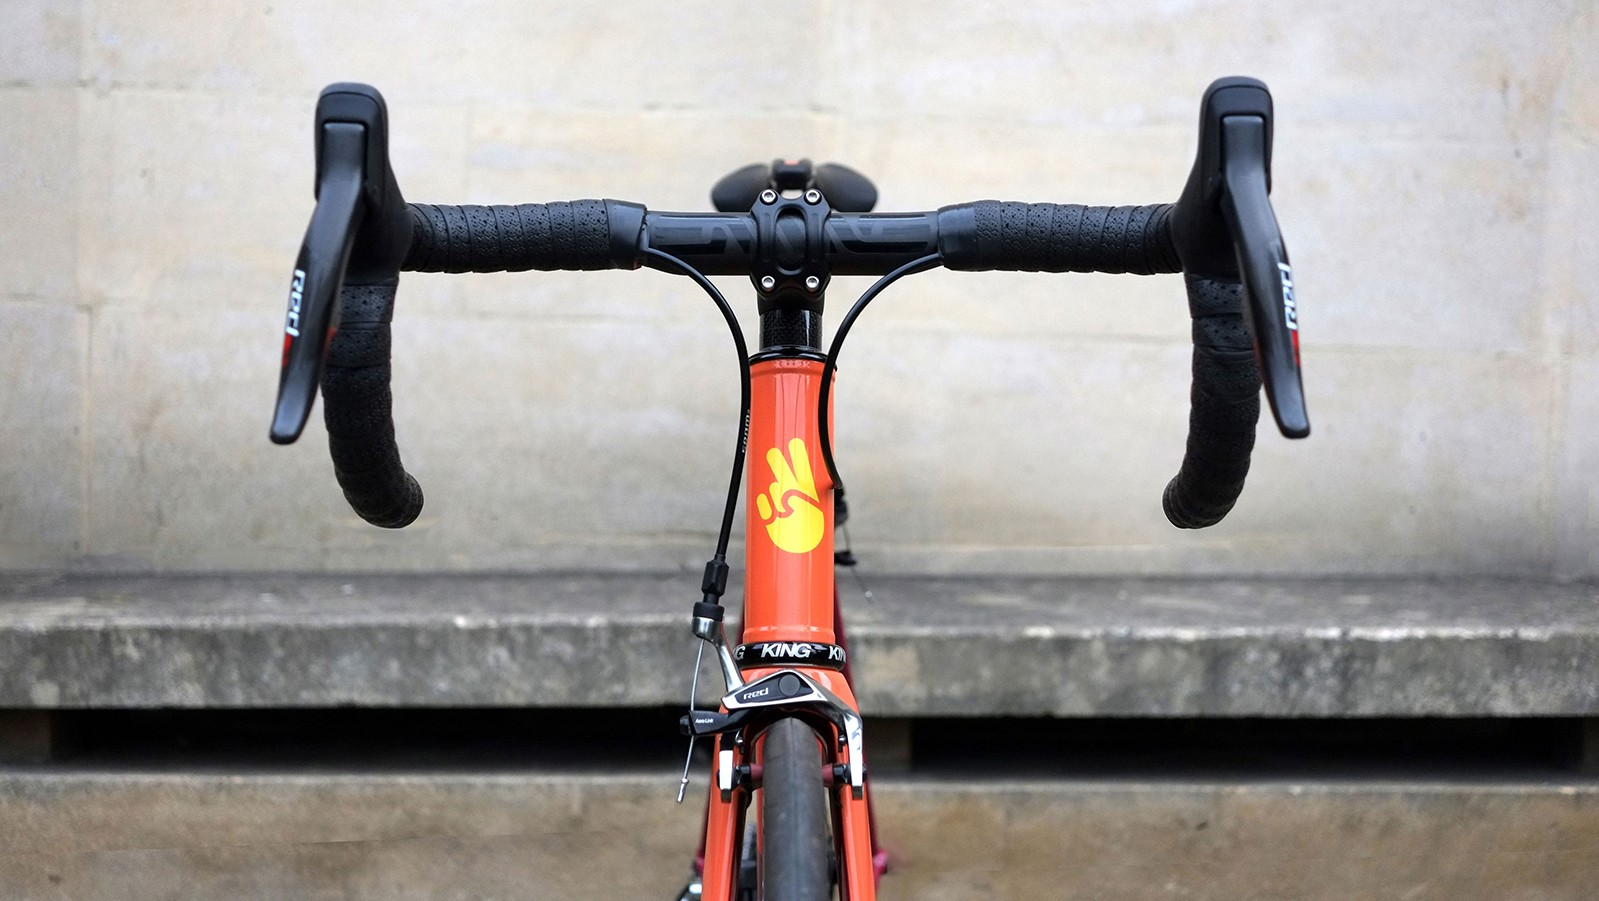 Mercredi Bikes won the builder's competition at Grinduro UK last year